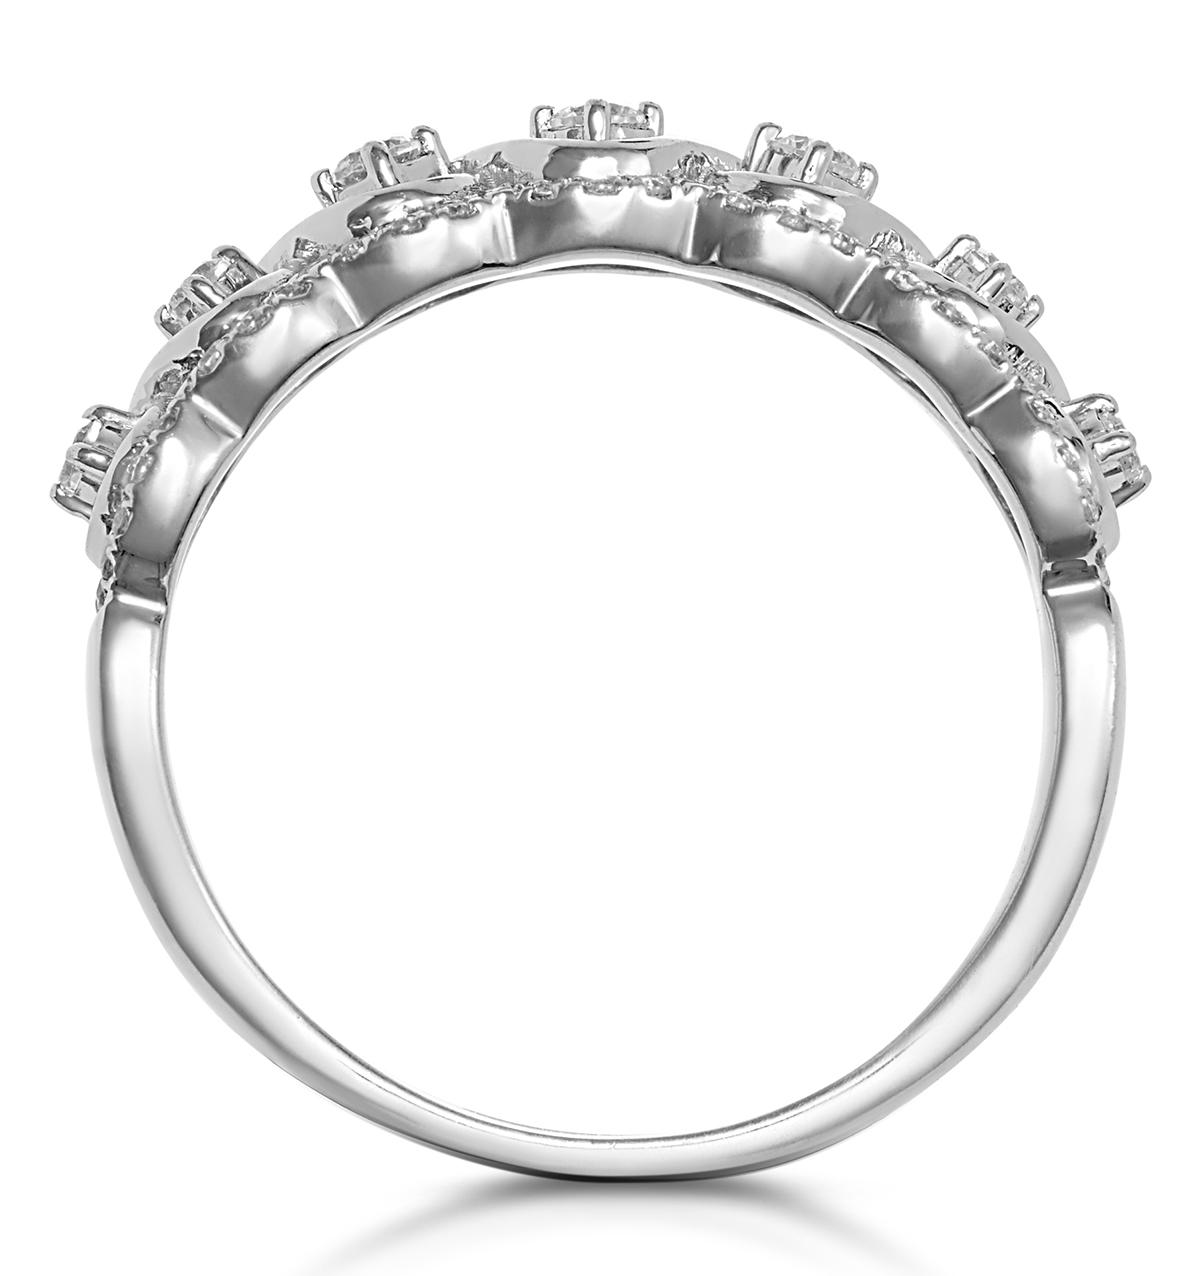 Ariane Diamond Half Eternity Ring 0.40ct Set in 18K White